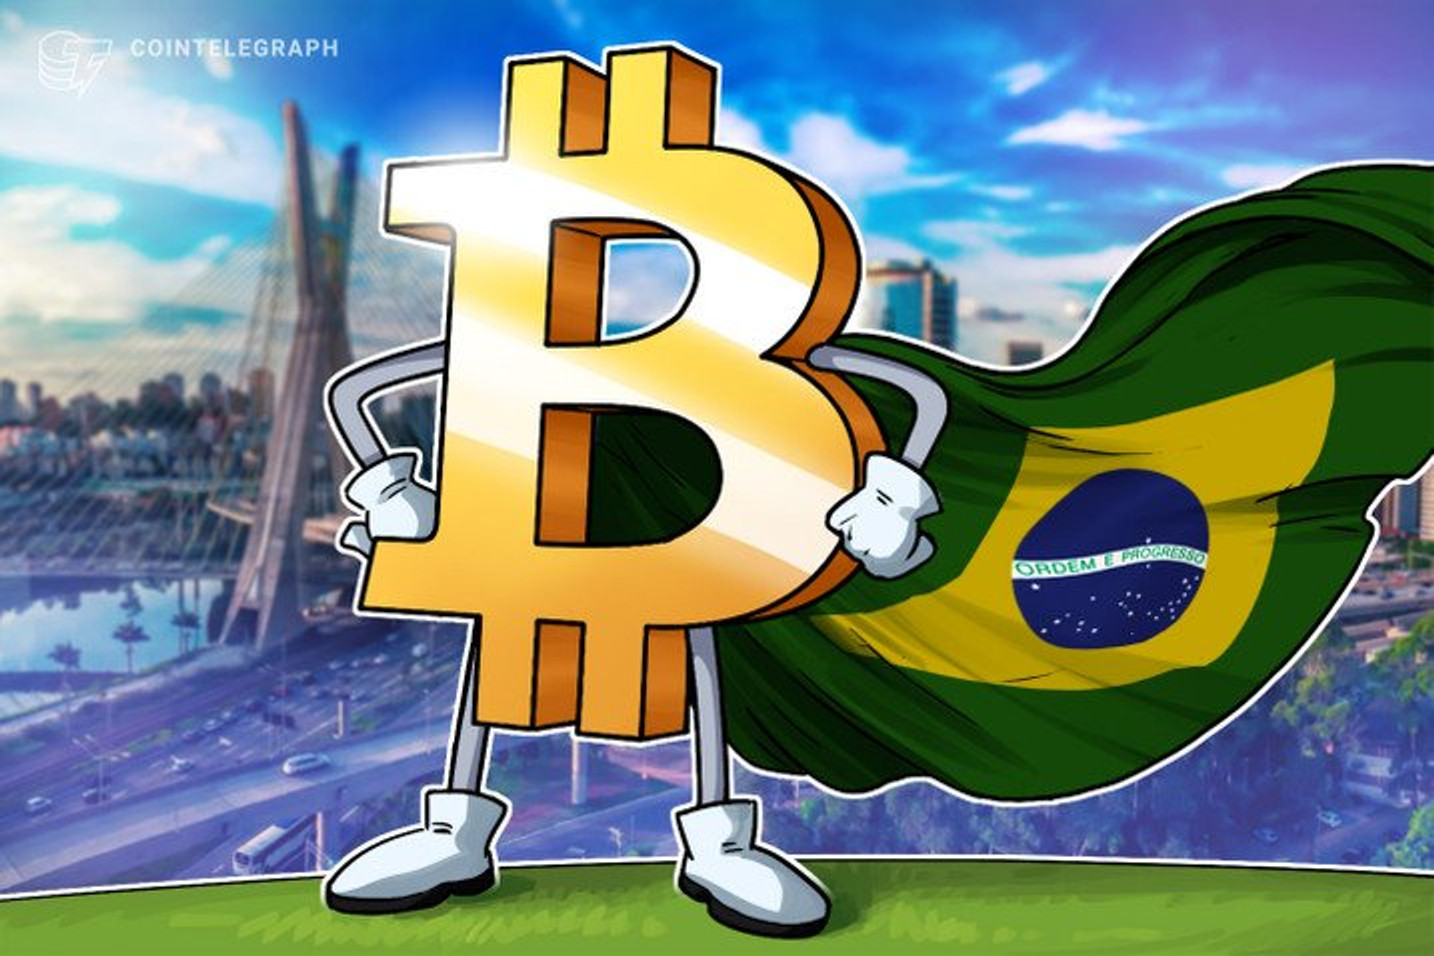 Mercado Bitcoin e Kraken são eleitas as melhores exchanges de Bitcoin da América